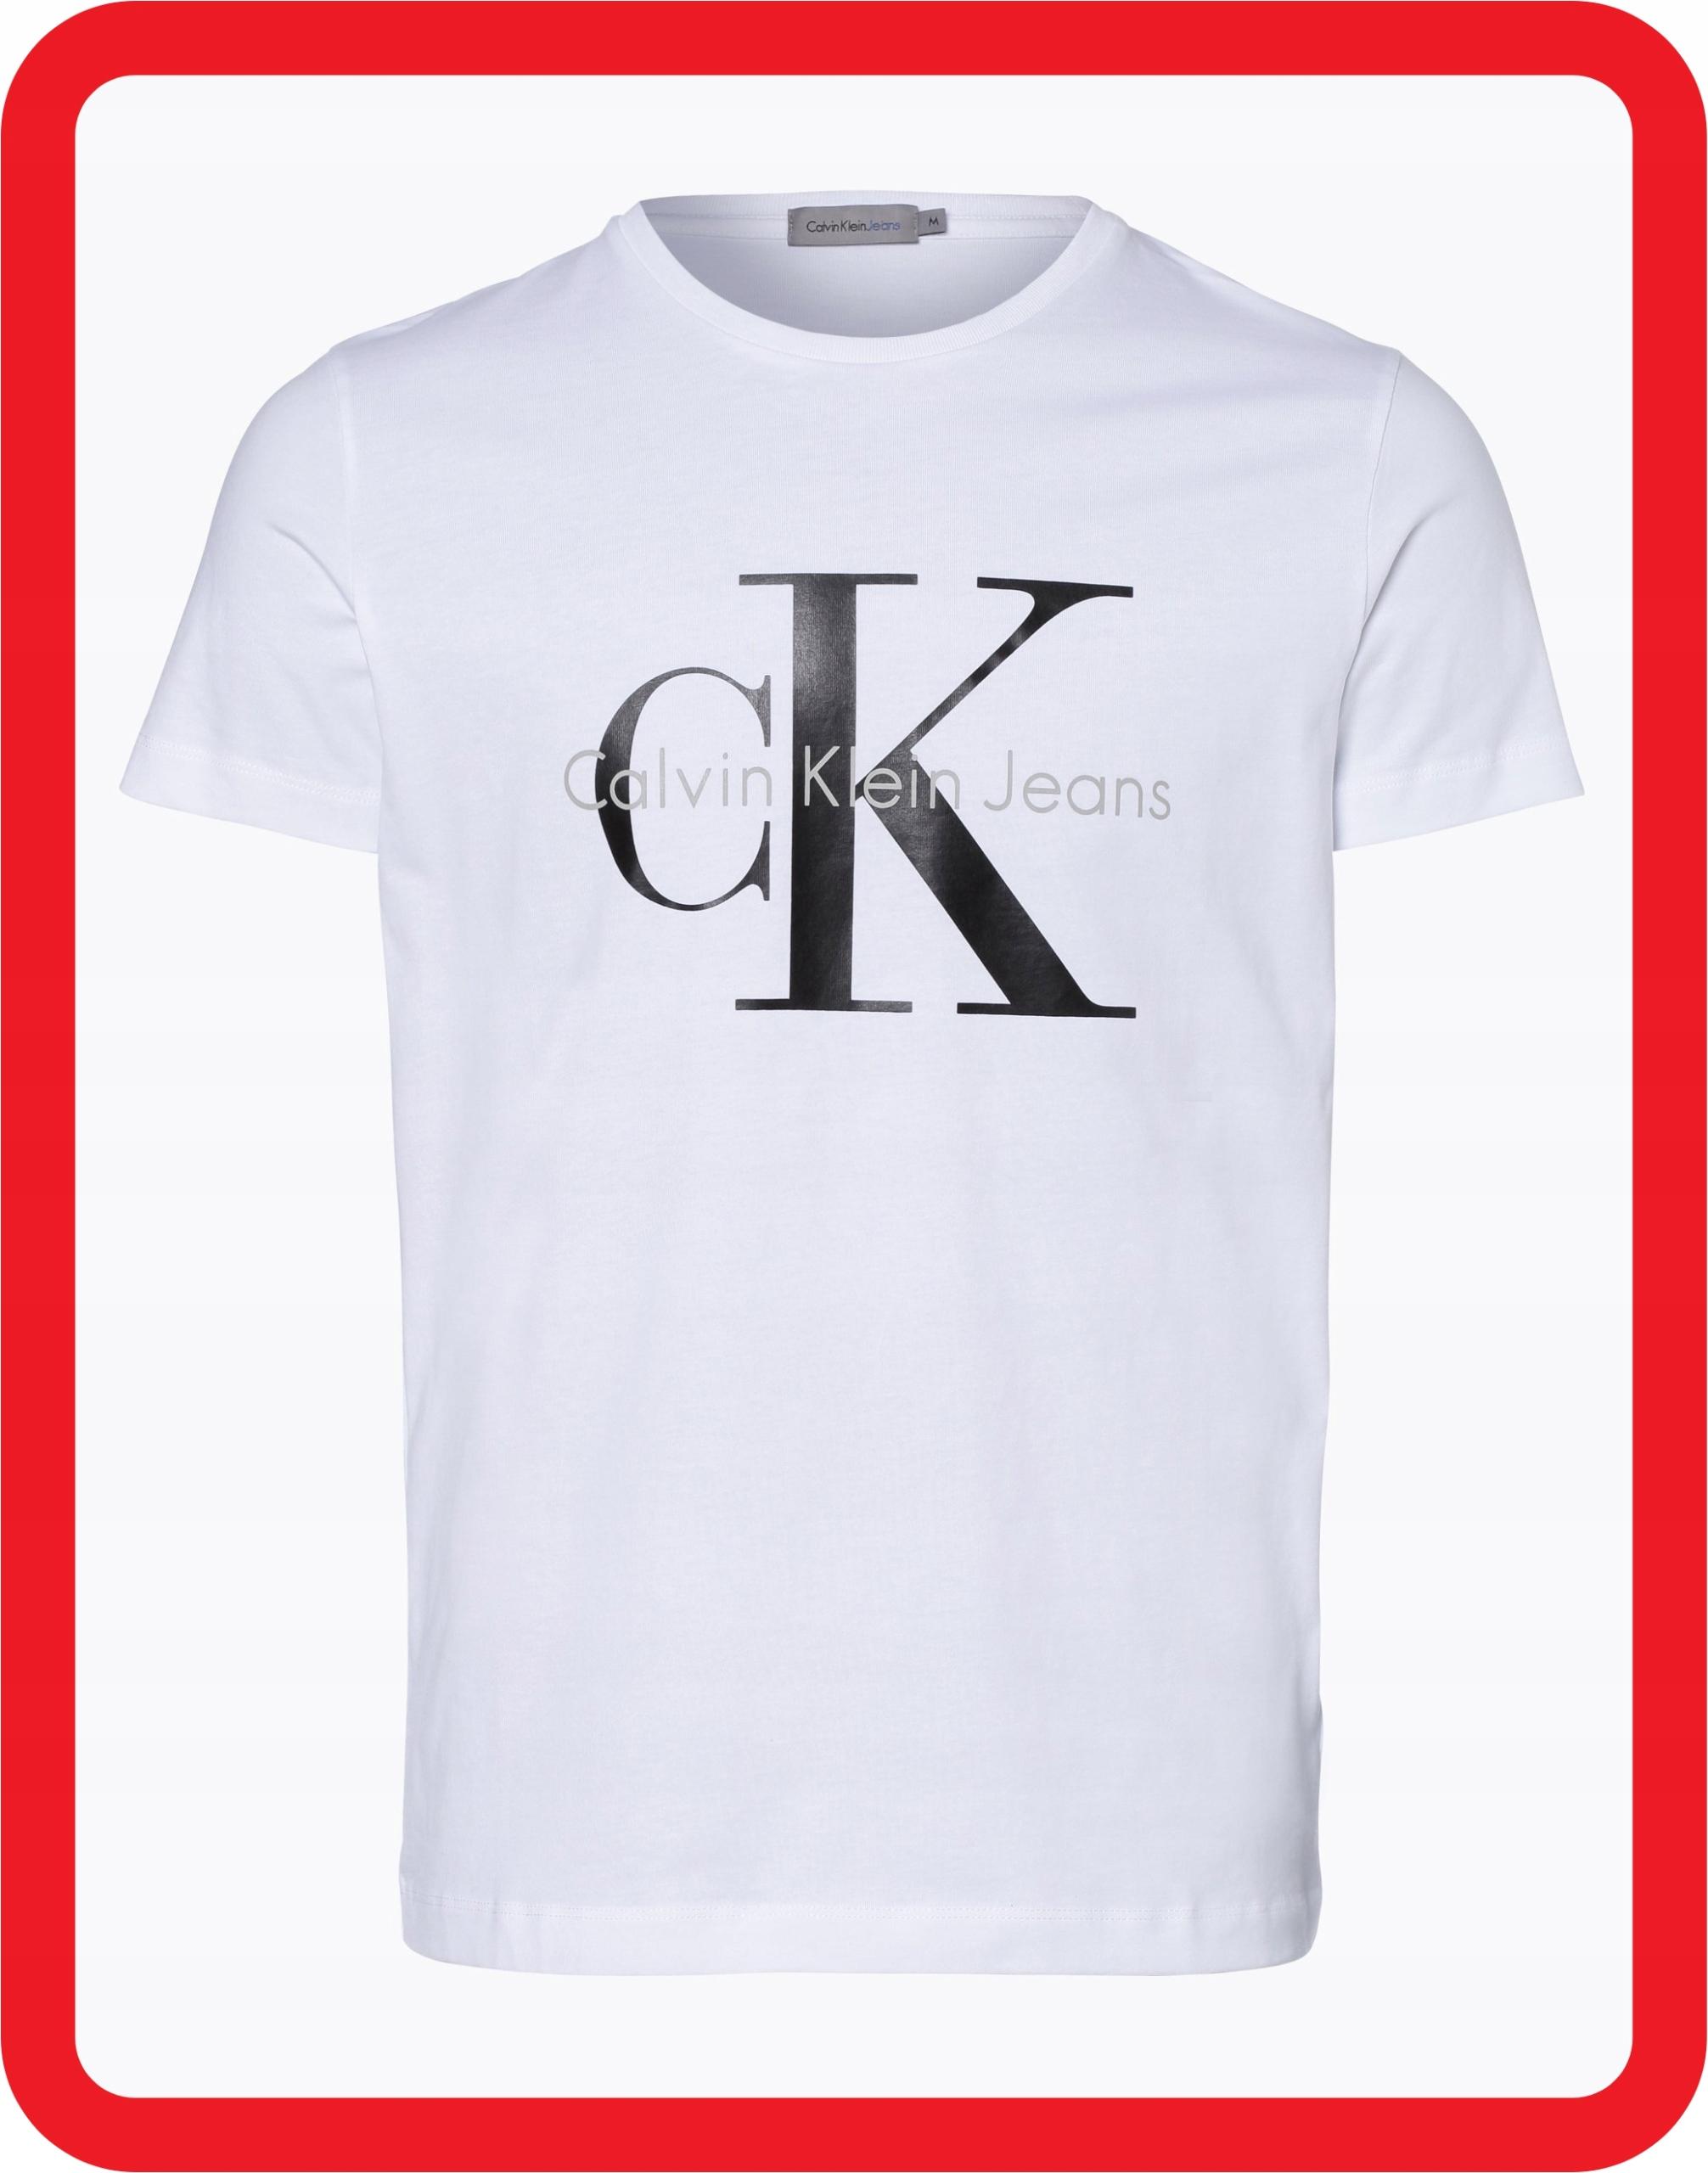 Calvin Klein T-Shirt Koszulka Męska M CK + PREZENT